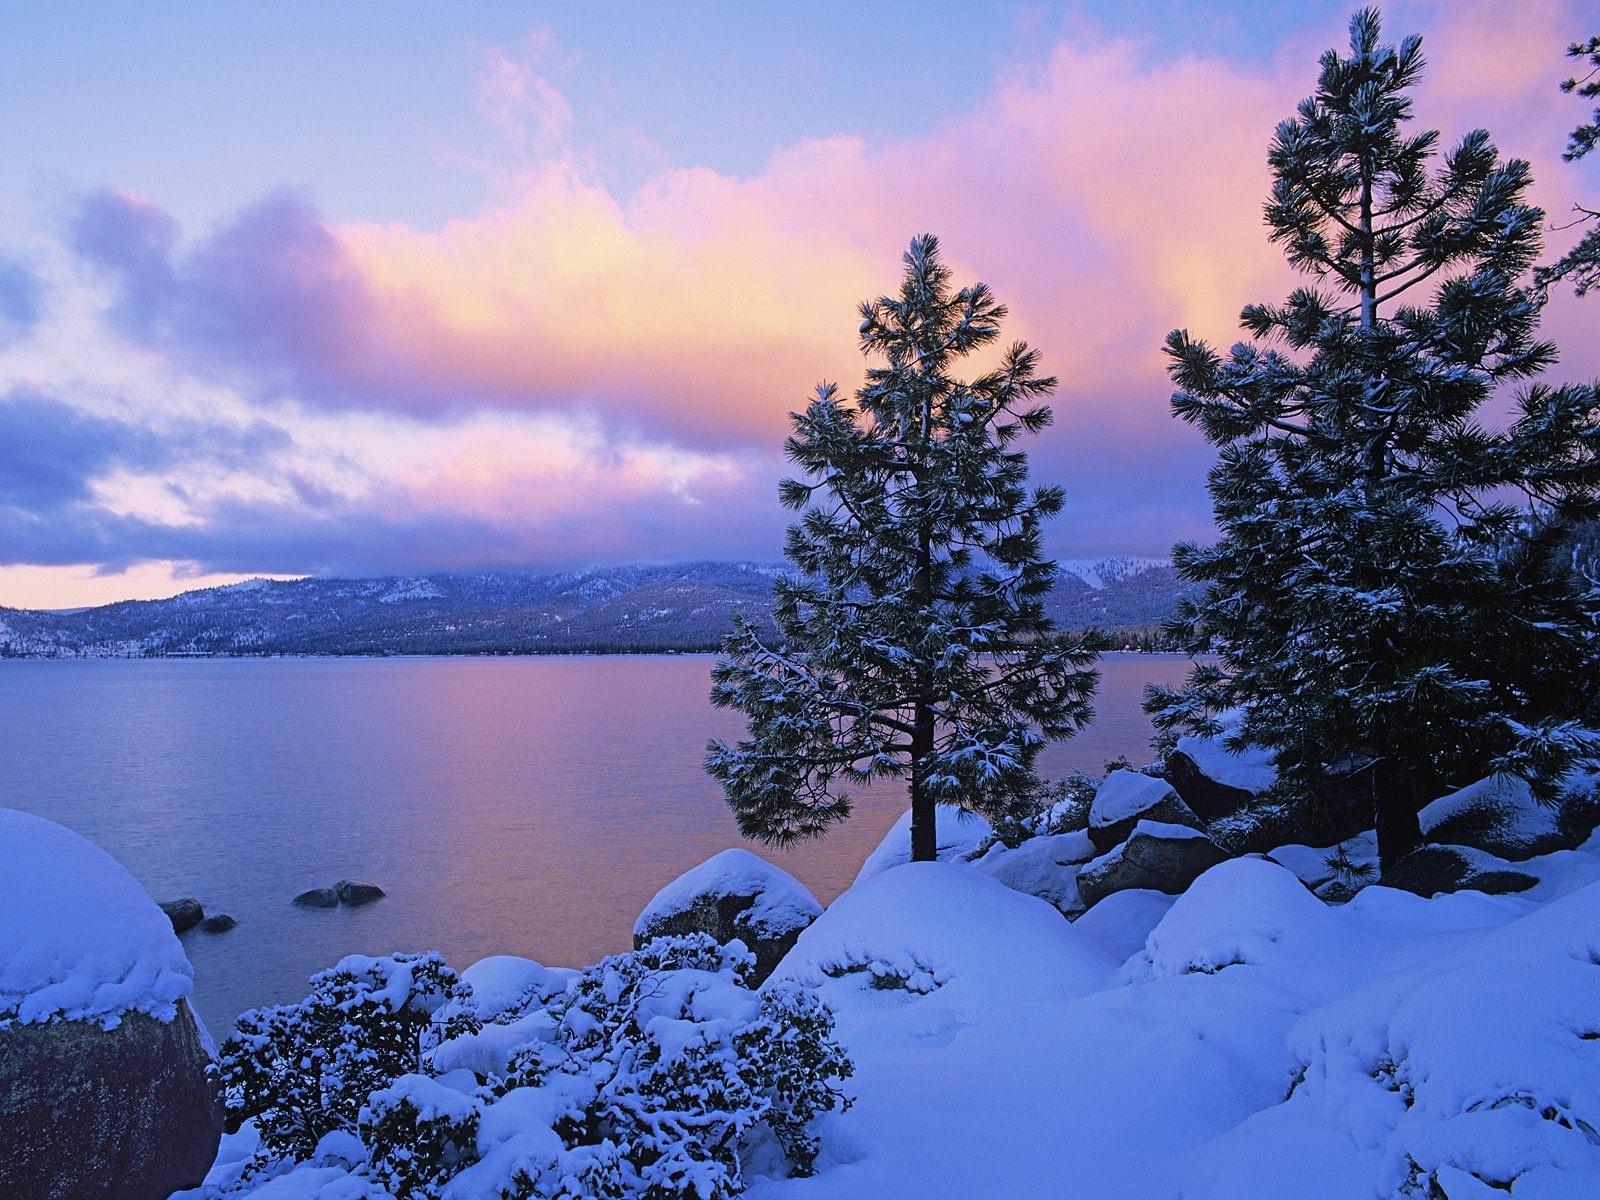 Neka na fotografiji bude... - Page 3 Lake_and_snow_nature_wallpaper-1600x1200